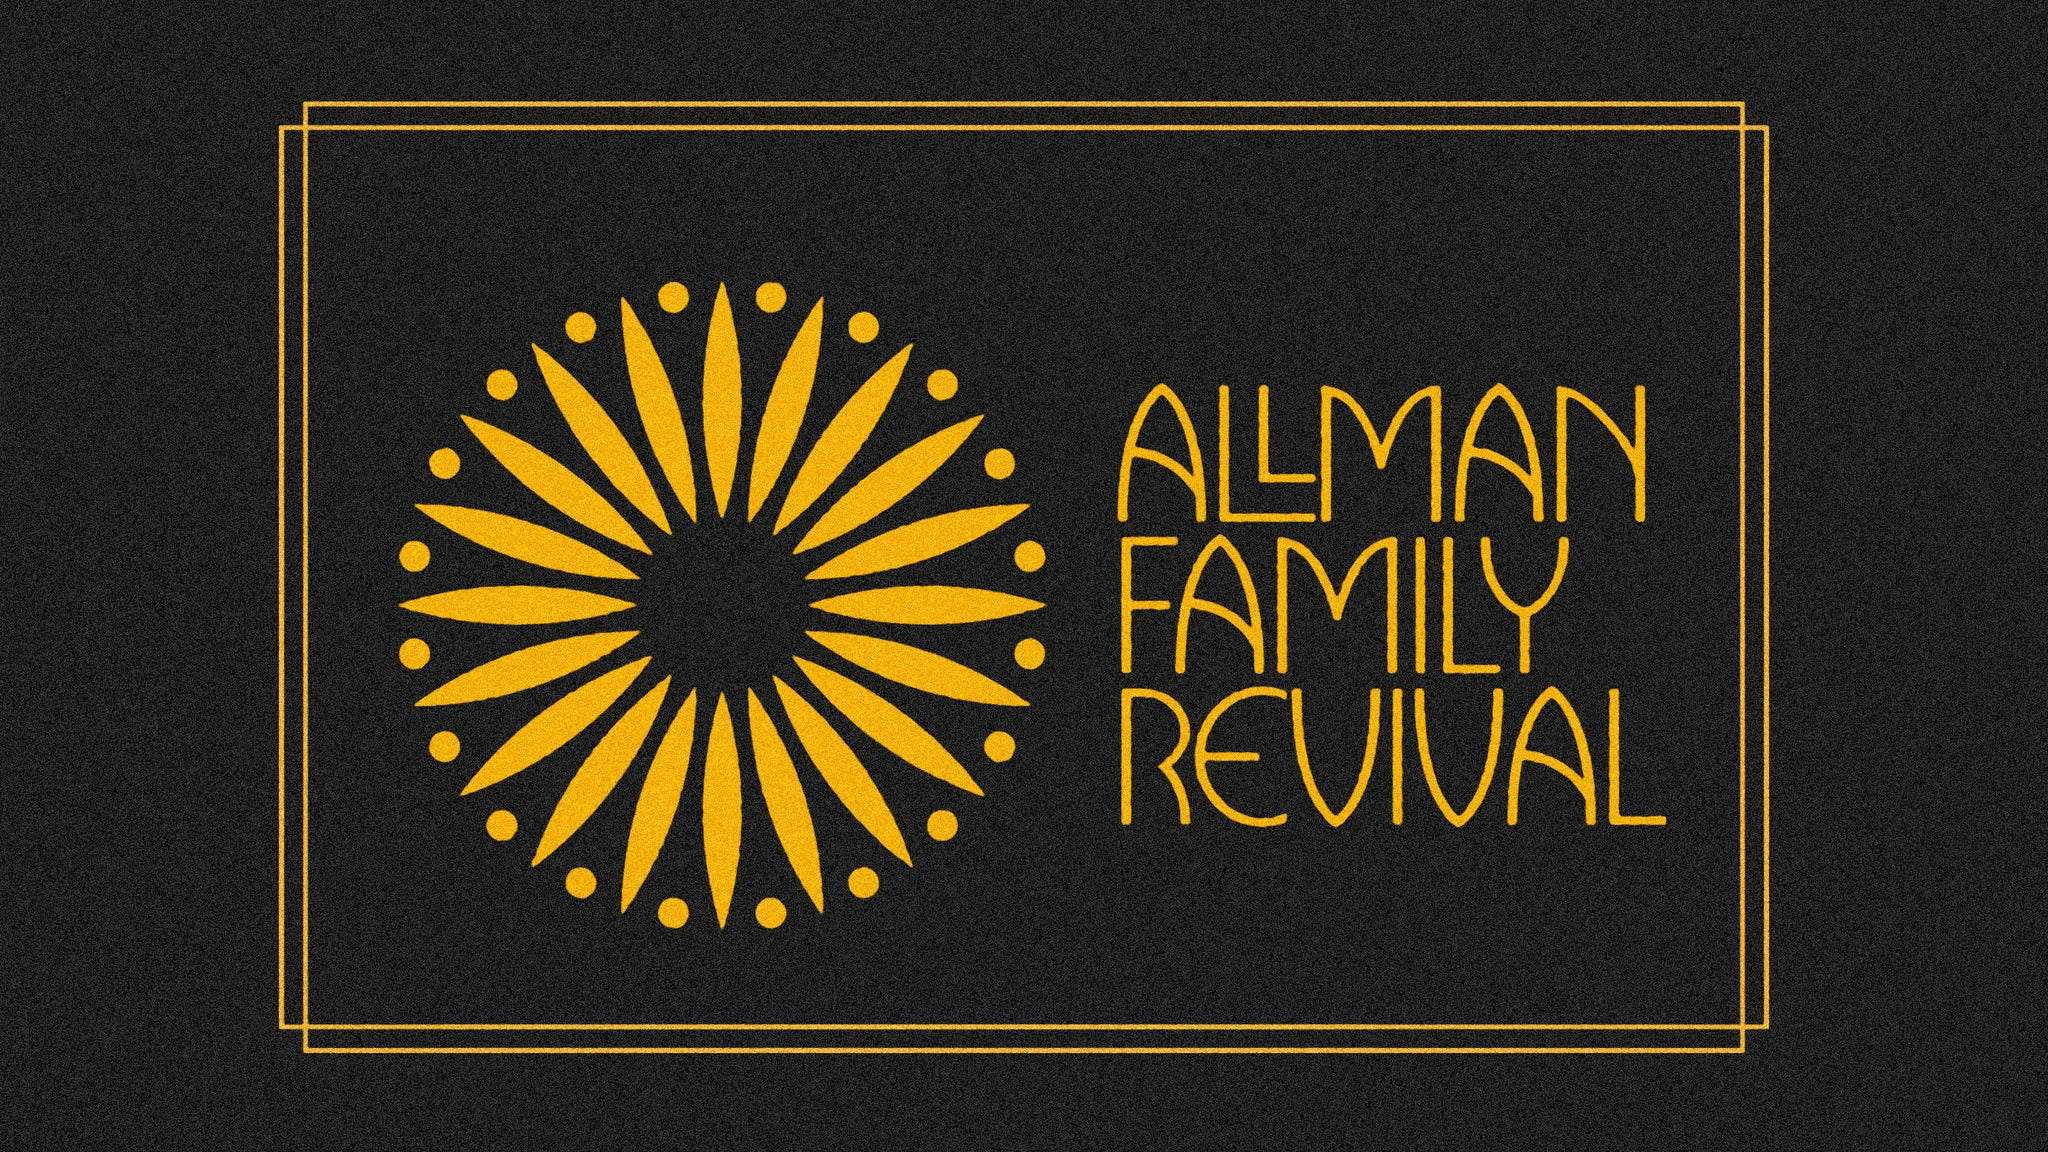 Allman Family Revival pre-sale password for event tickets in New York, NY (Beacon Theatre)